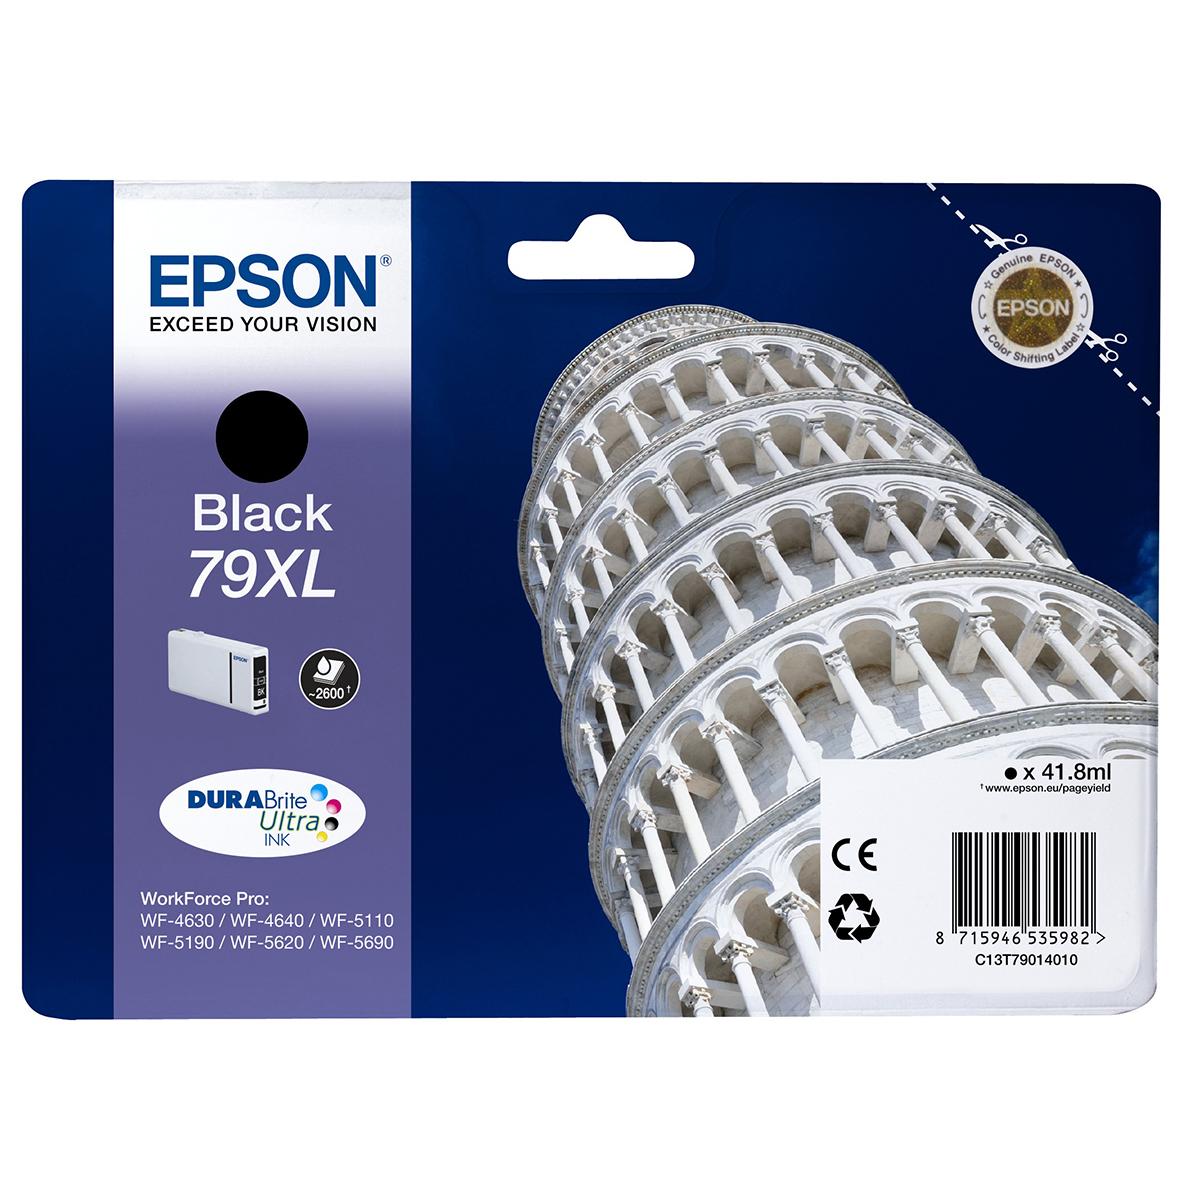 Epson 79XL Ink Cartridge Black